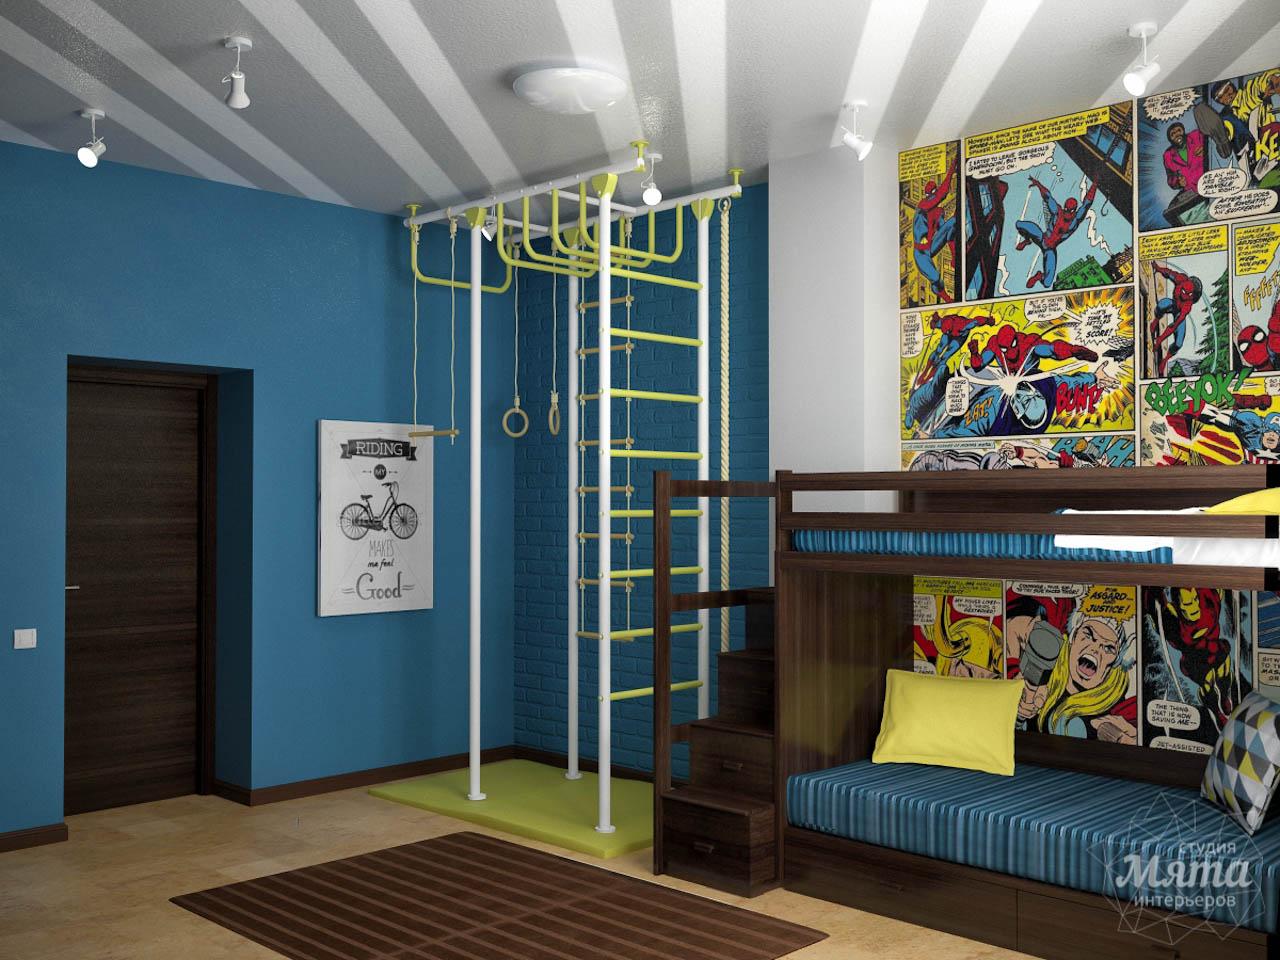 Дизайн проект интерьера коттеджа  в стиле минимализм по ул. Барвинка 15 img895717566